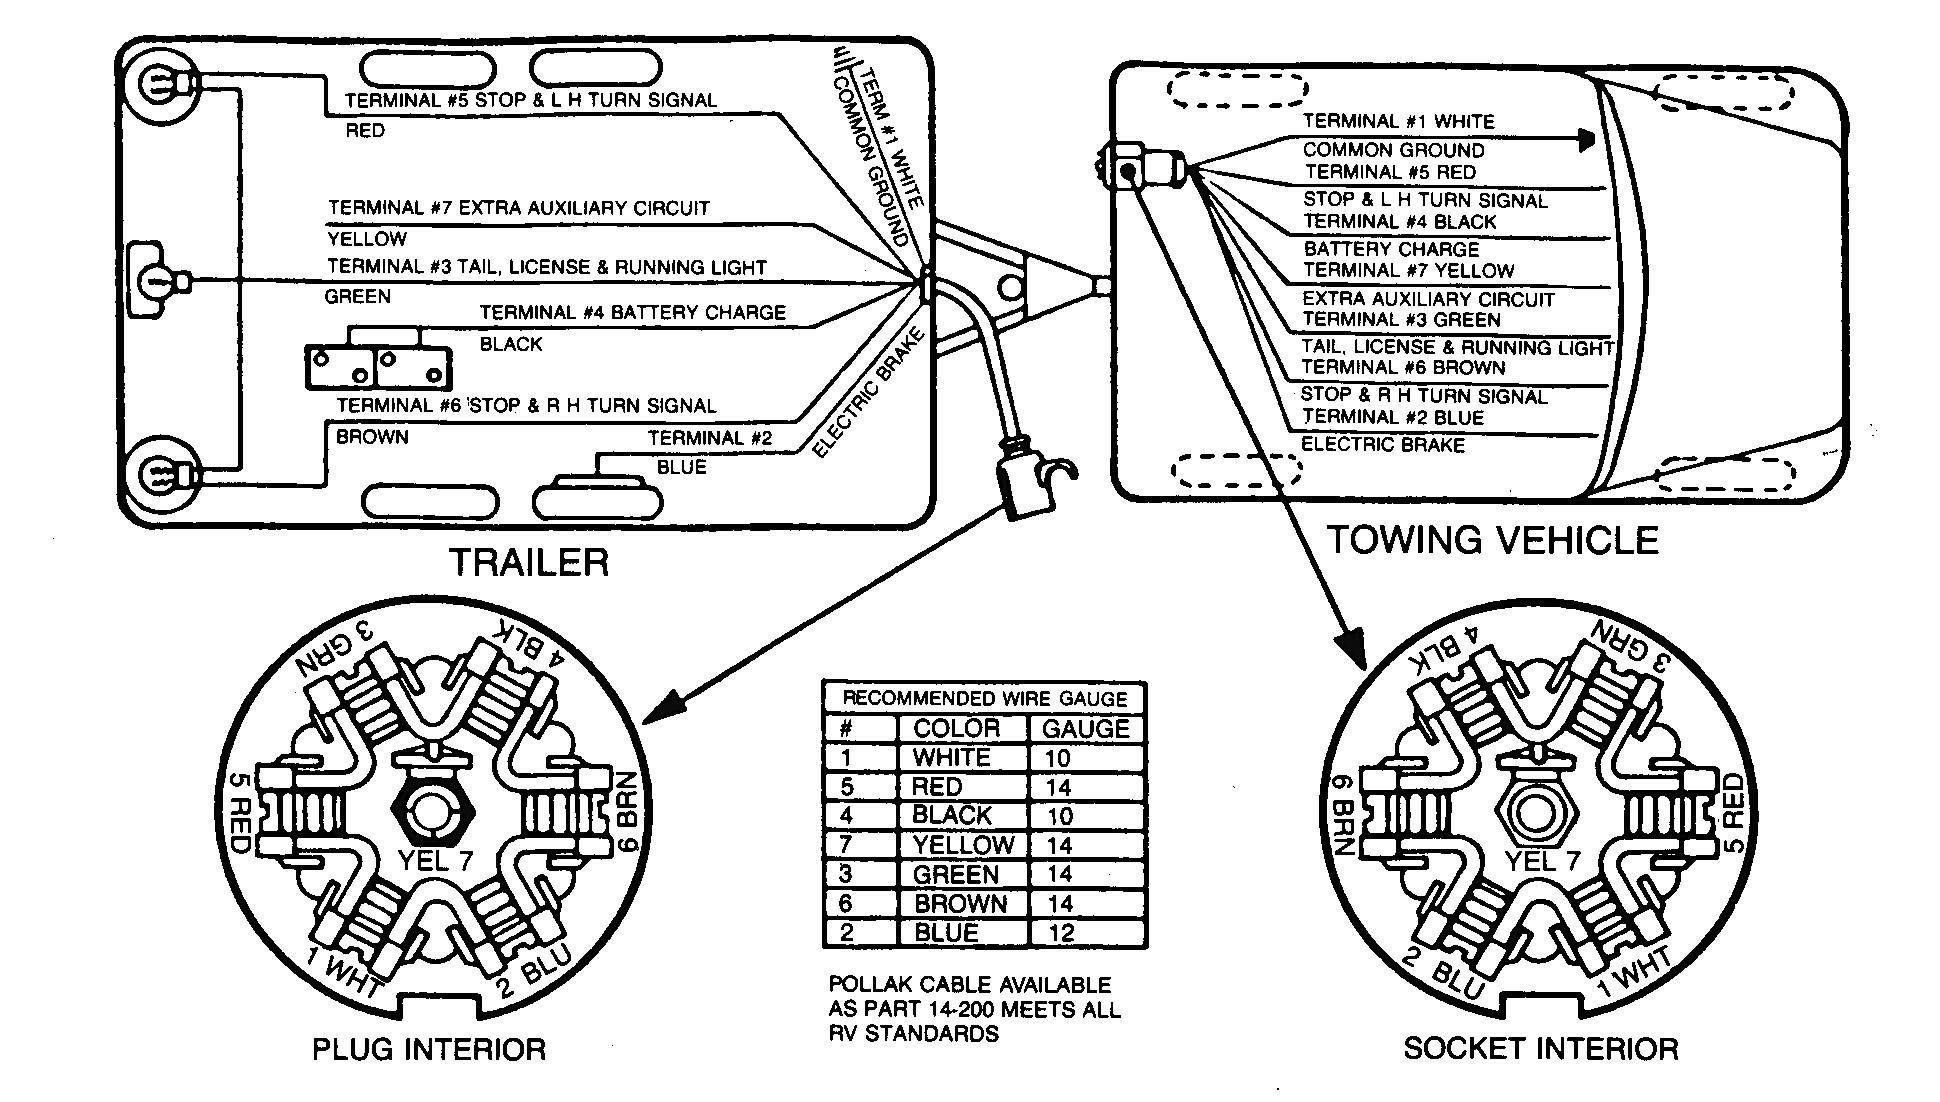 [DIAGRAM_3ER]  Big Tex Trailers Wiring Diagram - Troy Bilt Bronco Riding Mower Wiring  Diagram for Wiring Diagram Schematics | Big Tex 50la Brake Wiring Diagram |  | Wiring Diagram Schematics